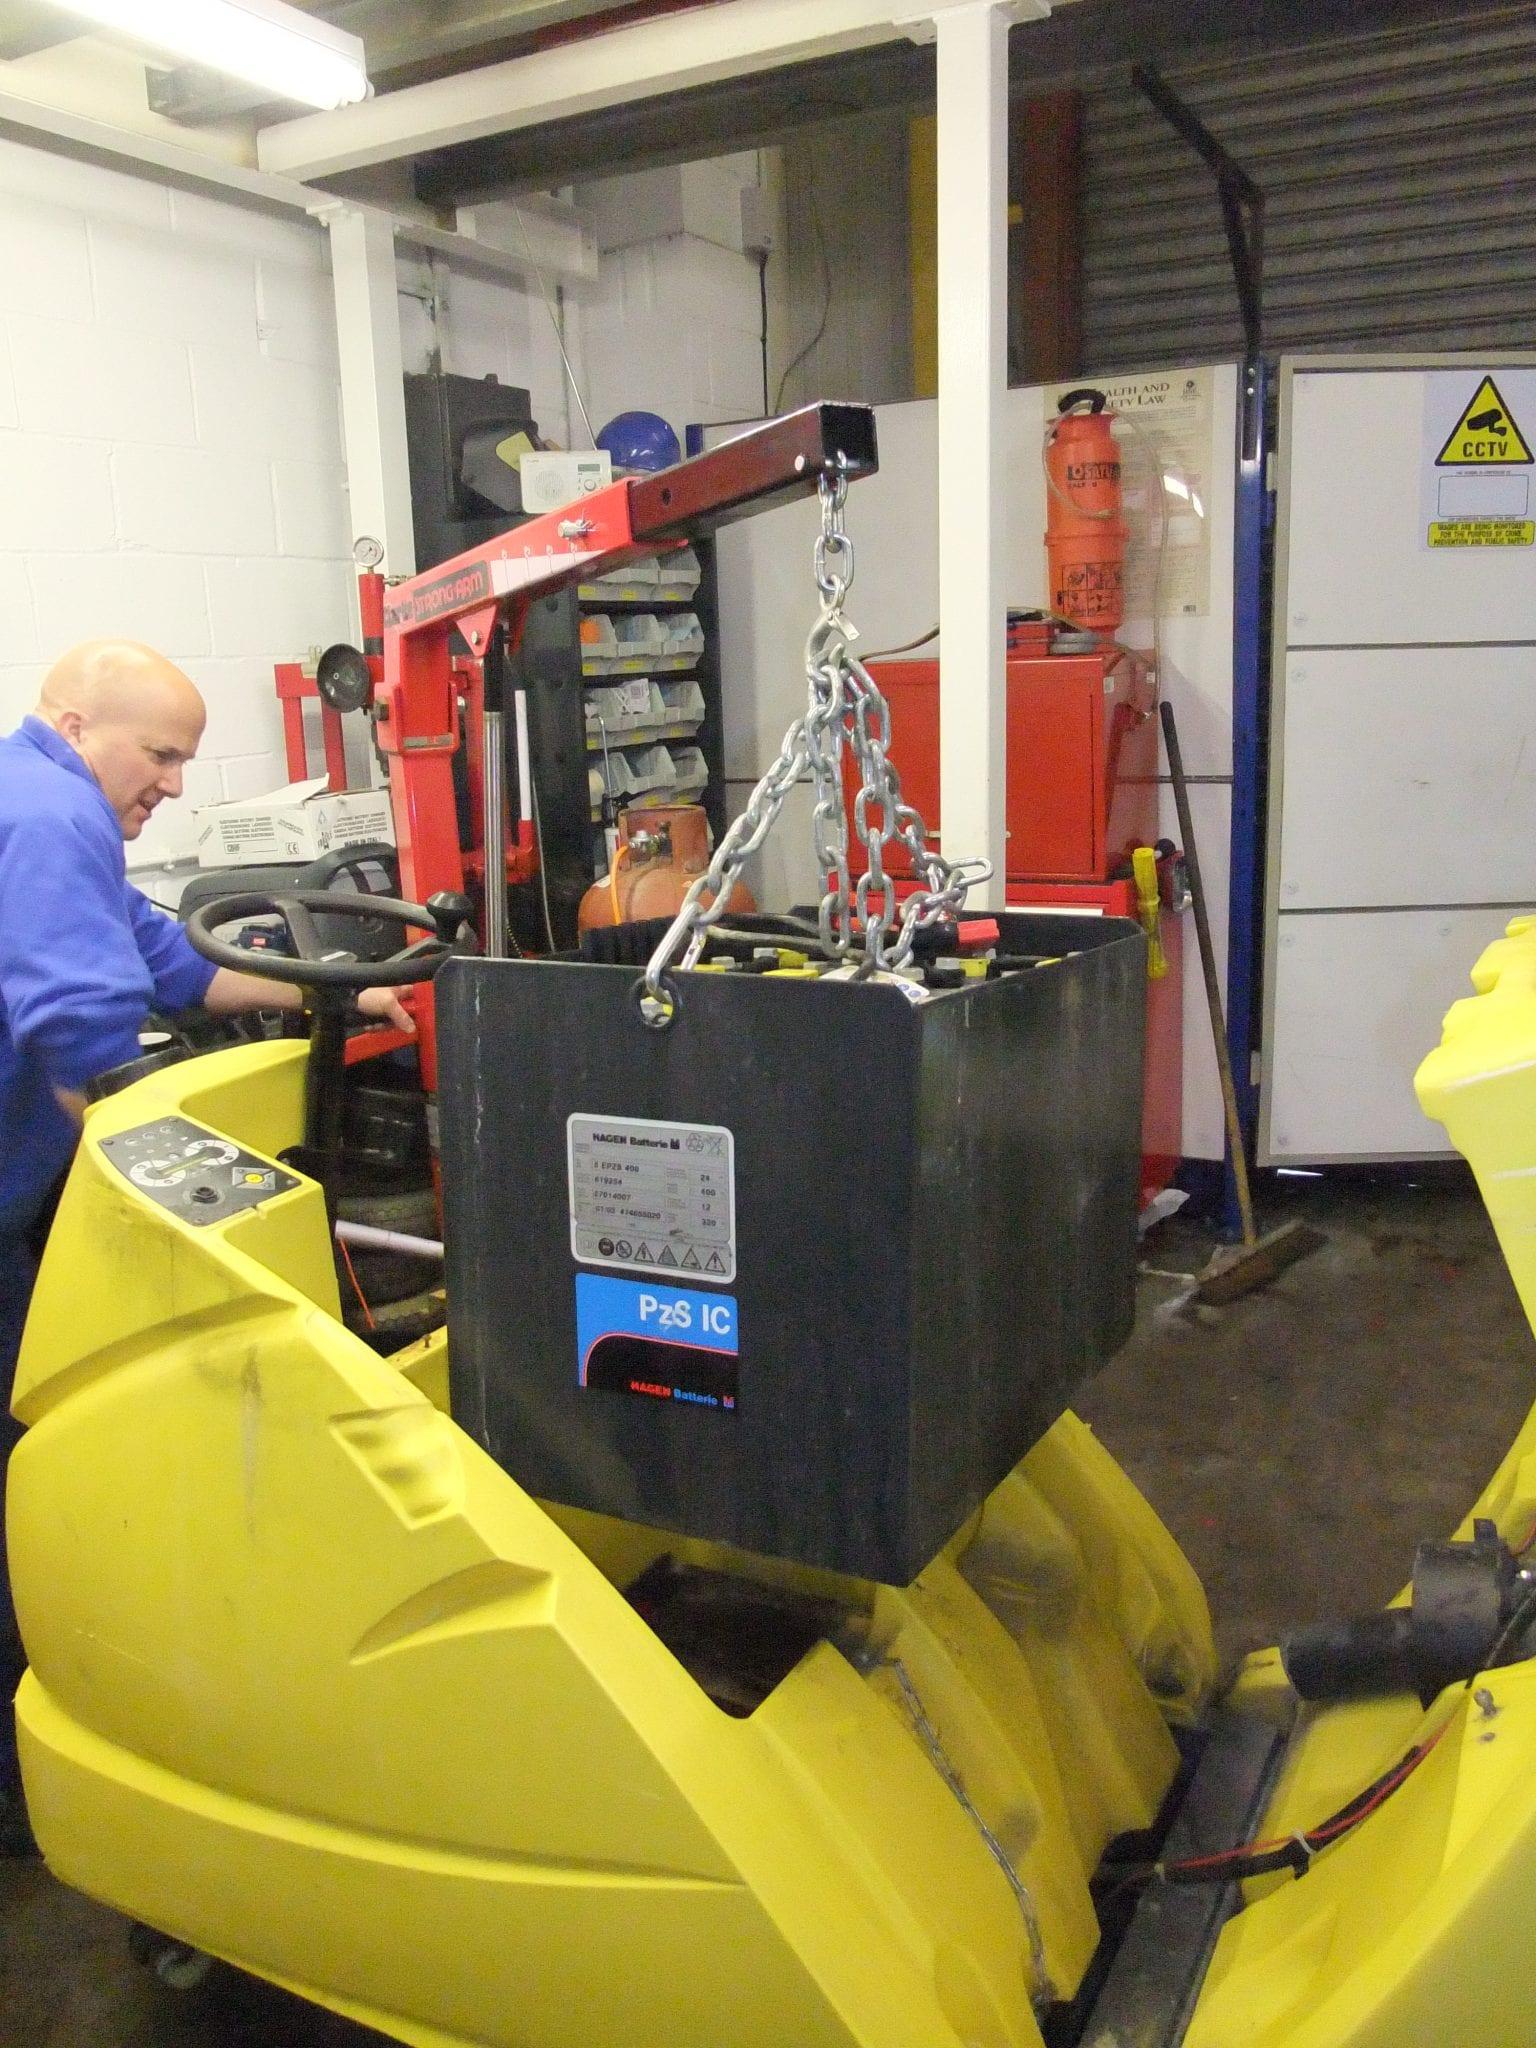 Karcher scrubber drier repairs